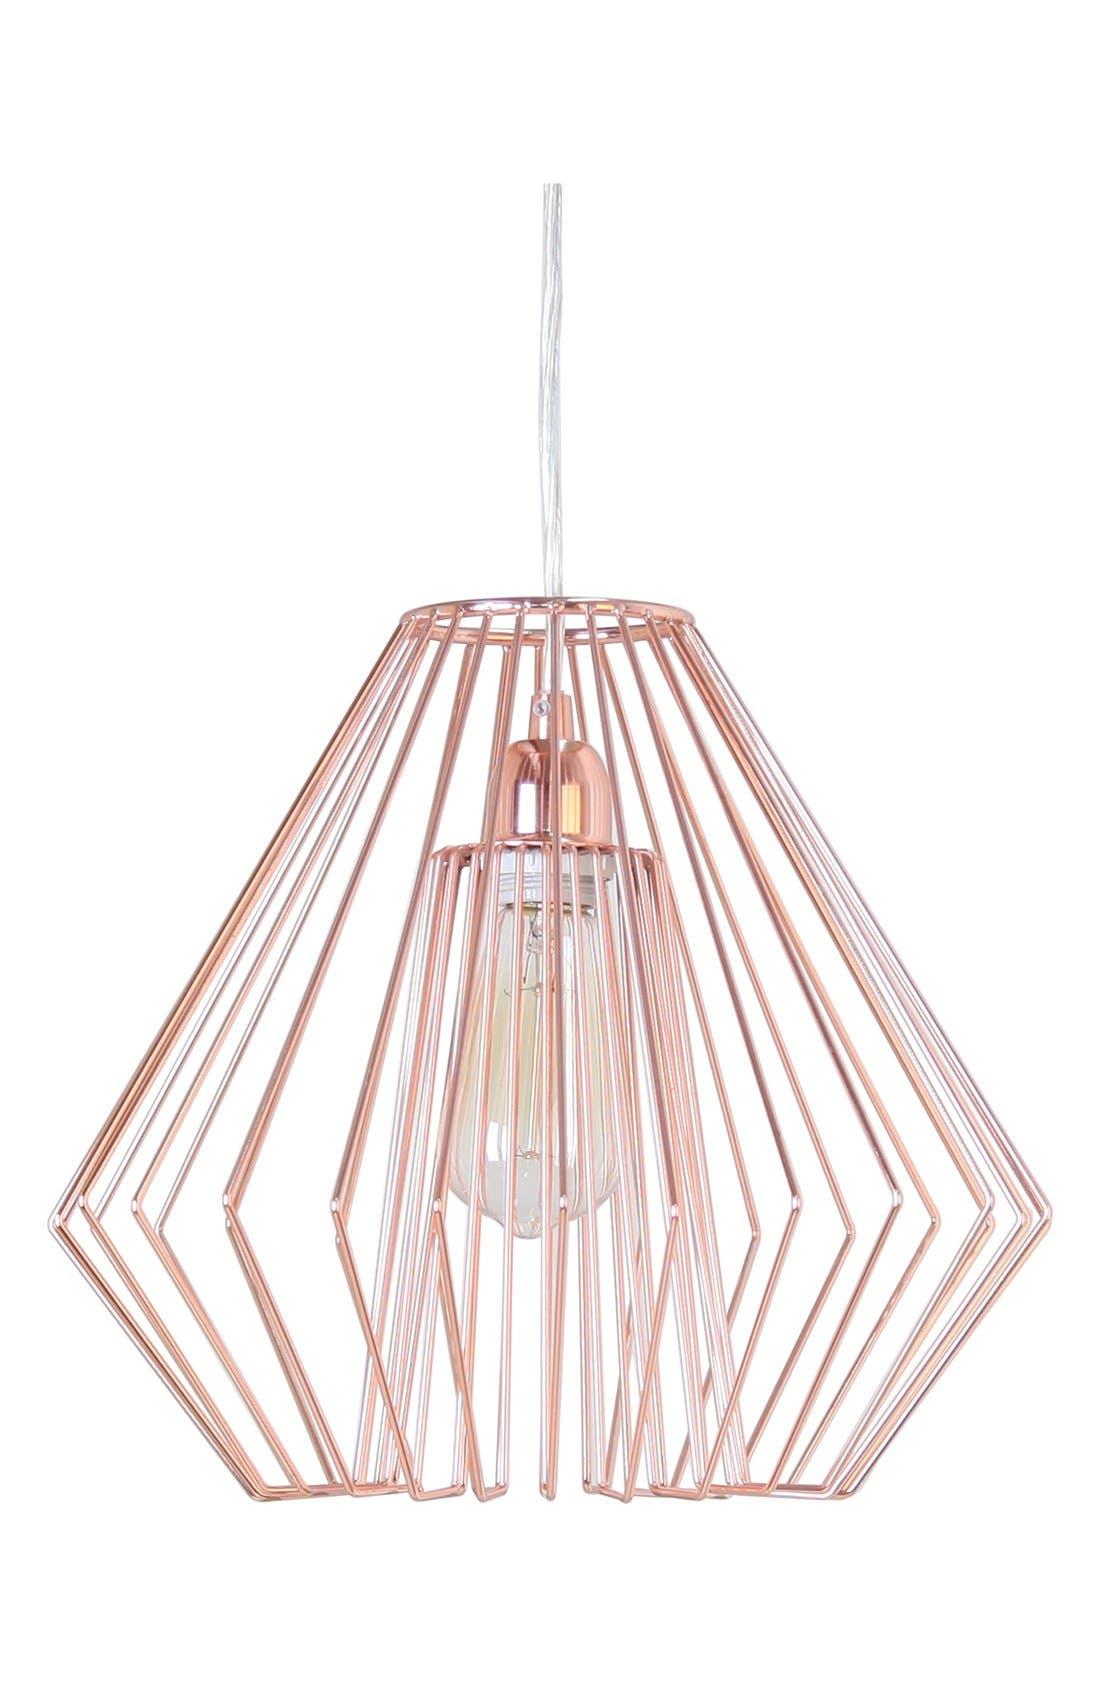 Metallic Hanging Lamp,                             Main thumbnail 1, color,                             220